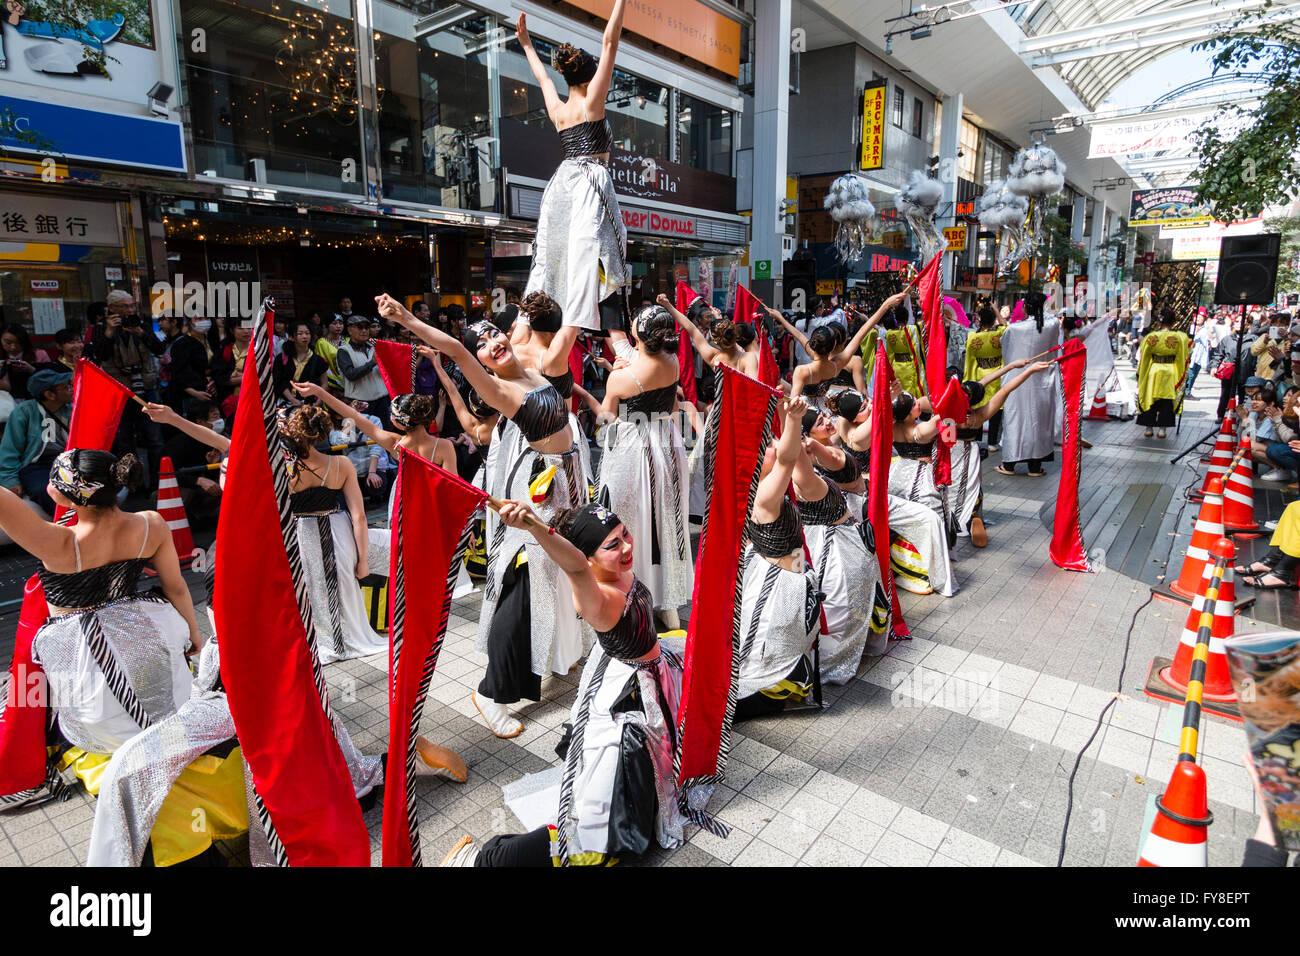 Japan, Kumamoto. Yosakoi Hinokuni festival. Women dance troupe, black & white costume, dancing in shopping centre. - Stock Image